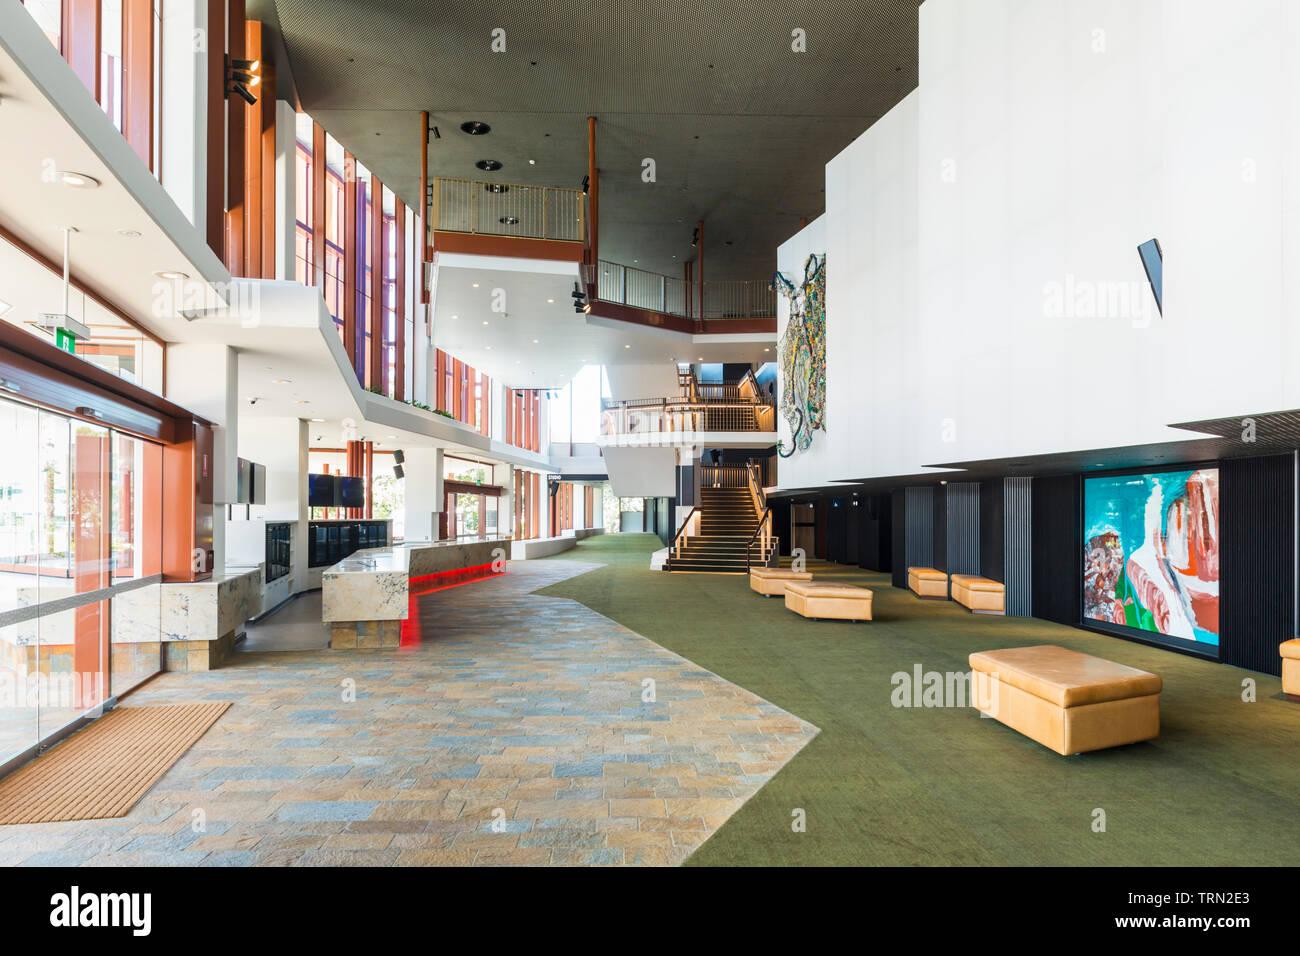 Il foyer del Cairns Performing Arts Center, completato nel tardo 2018. Cairns, Queensland, Australia Foto Stock